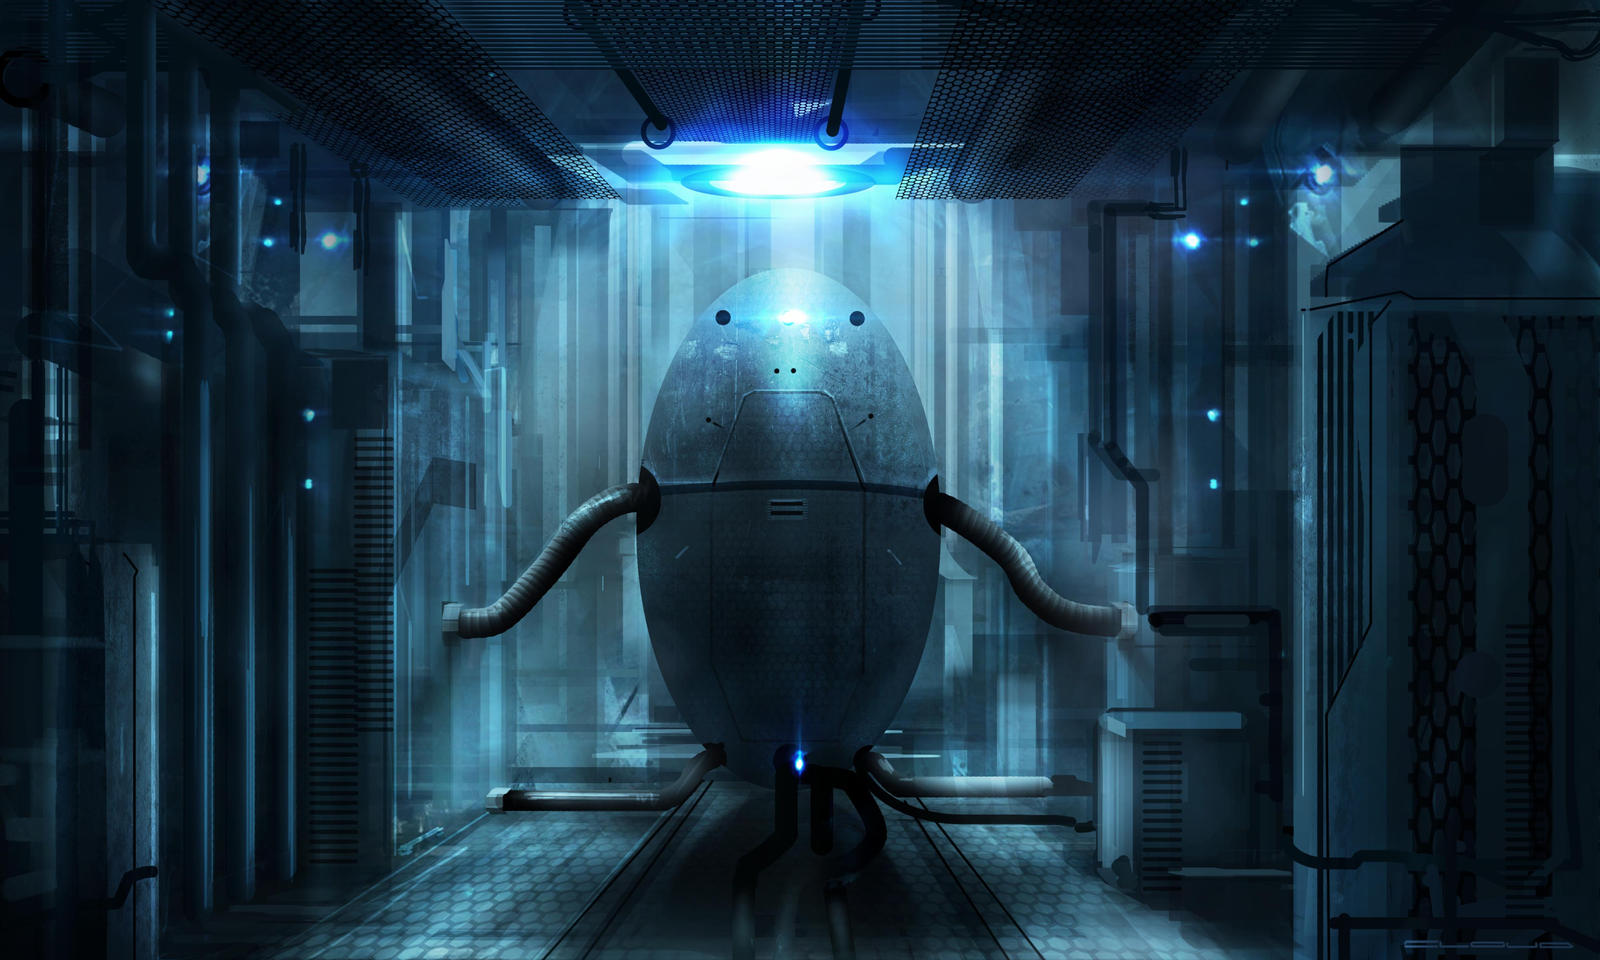 Egg Chamber by Darkcloud013